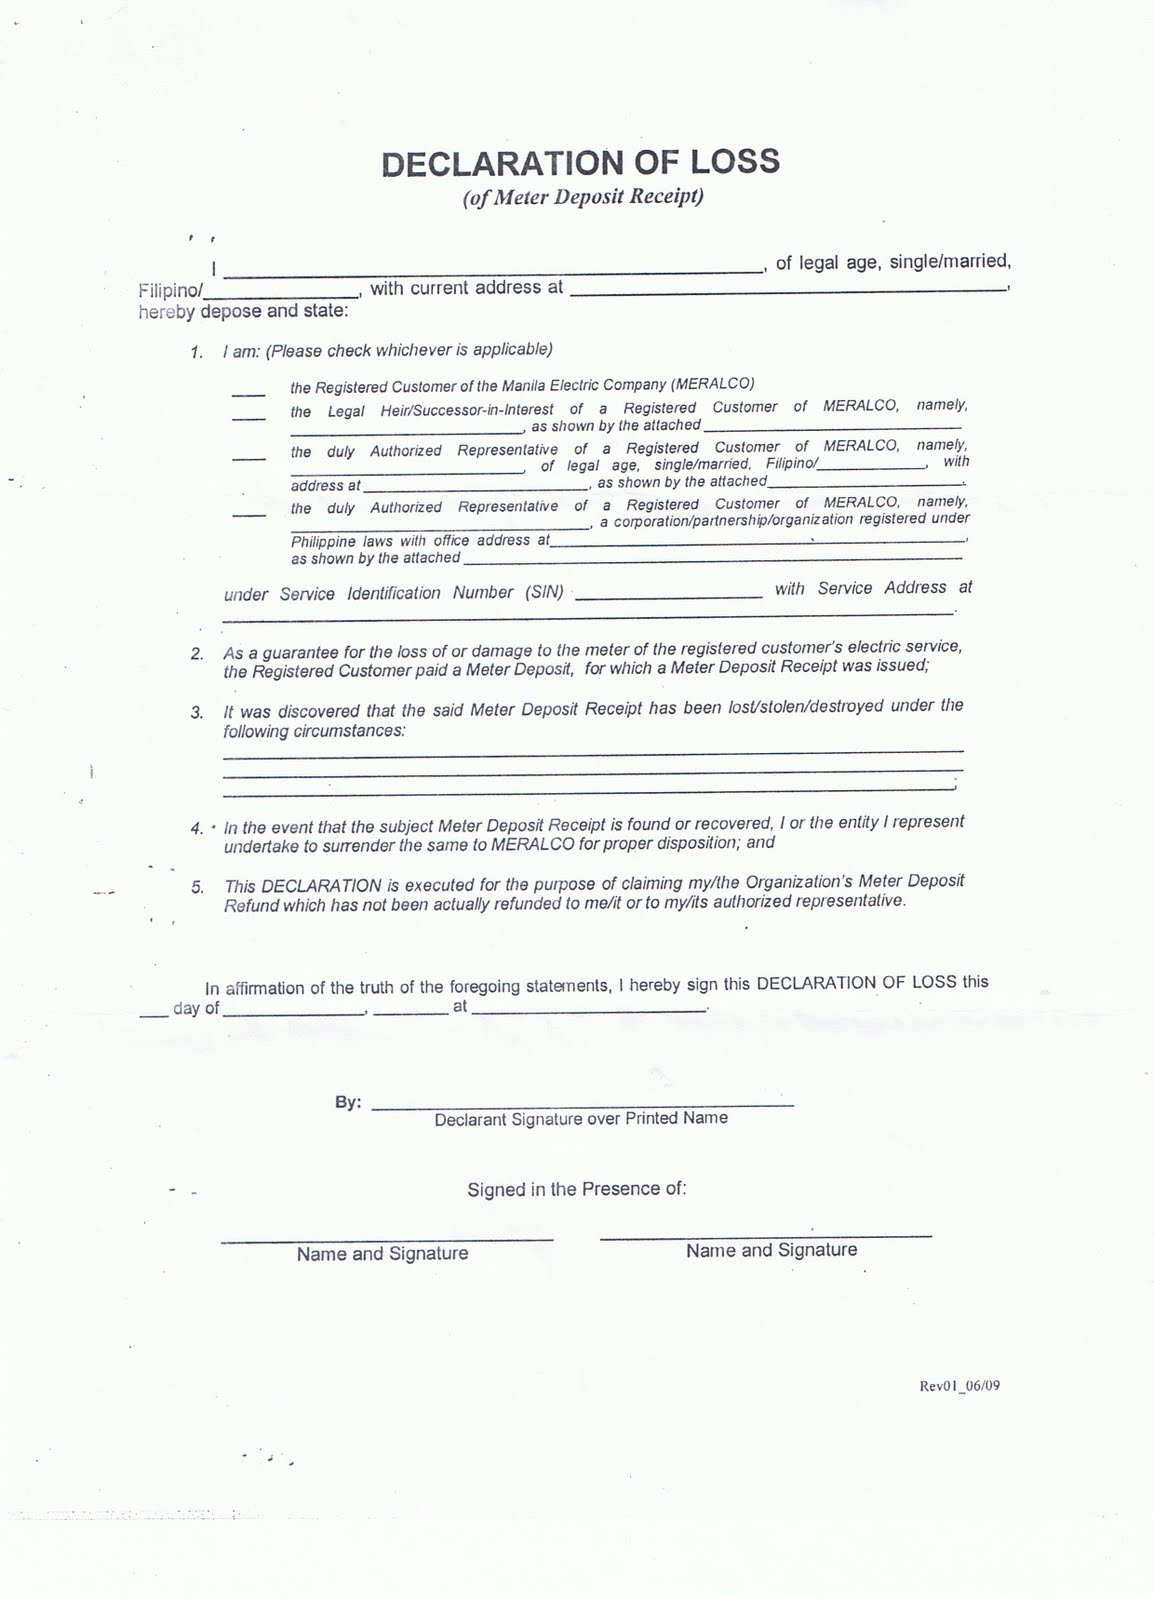 Meralco Deposit Refund | Noelizm  Affidavit Of Loss Template